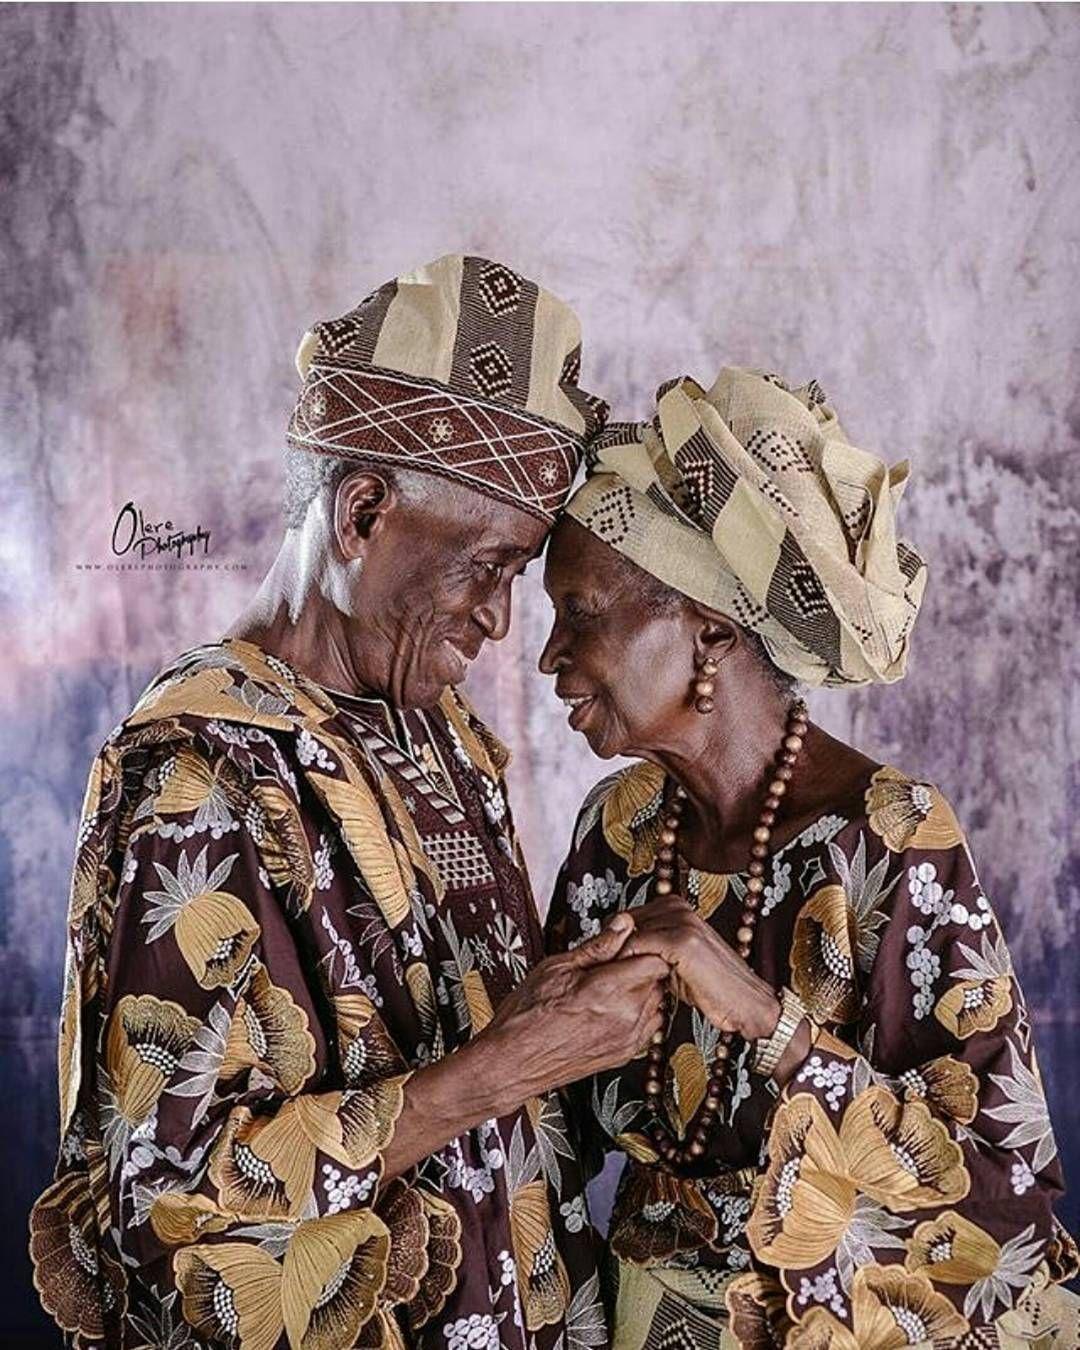 A forever kind of love… Via @olerephotography , —— #Osengwa | #